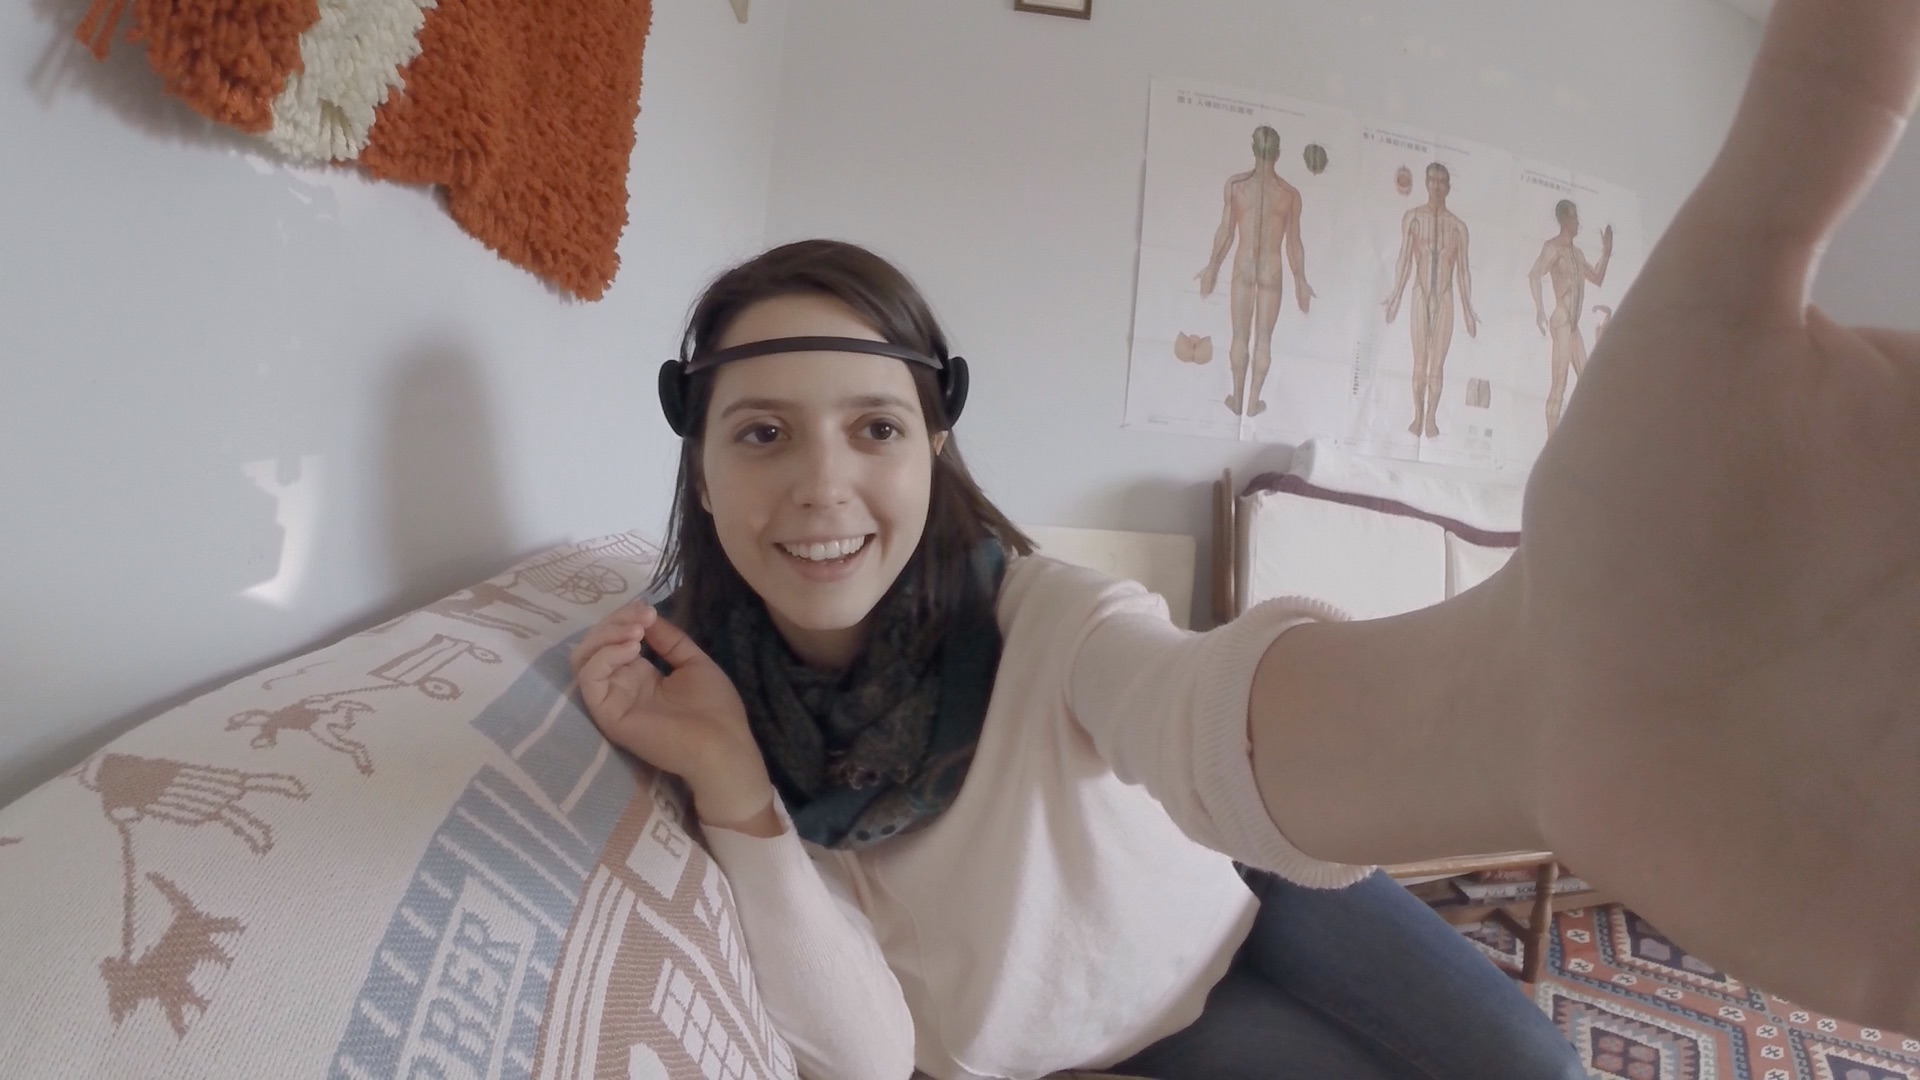 DIR. ELLI RAYNAI Canada  |  12 Mins  |  360 VR Video